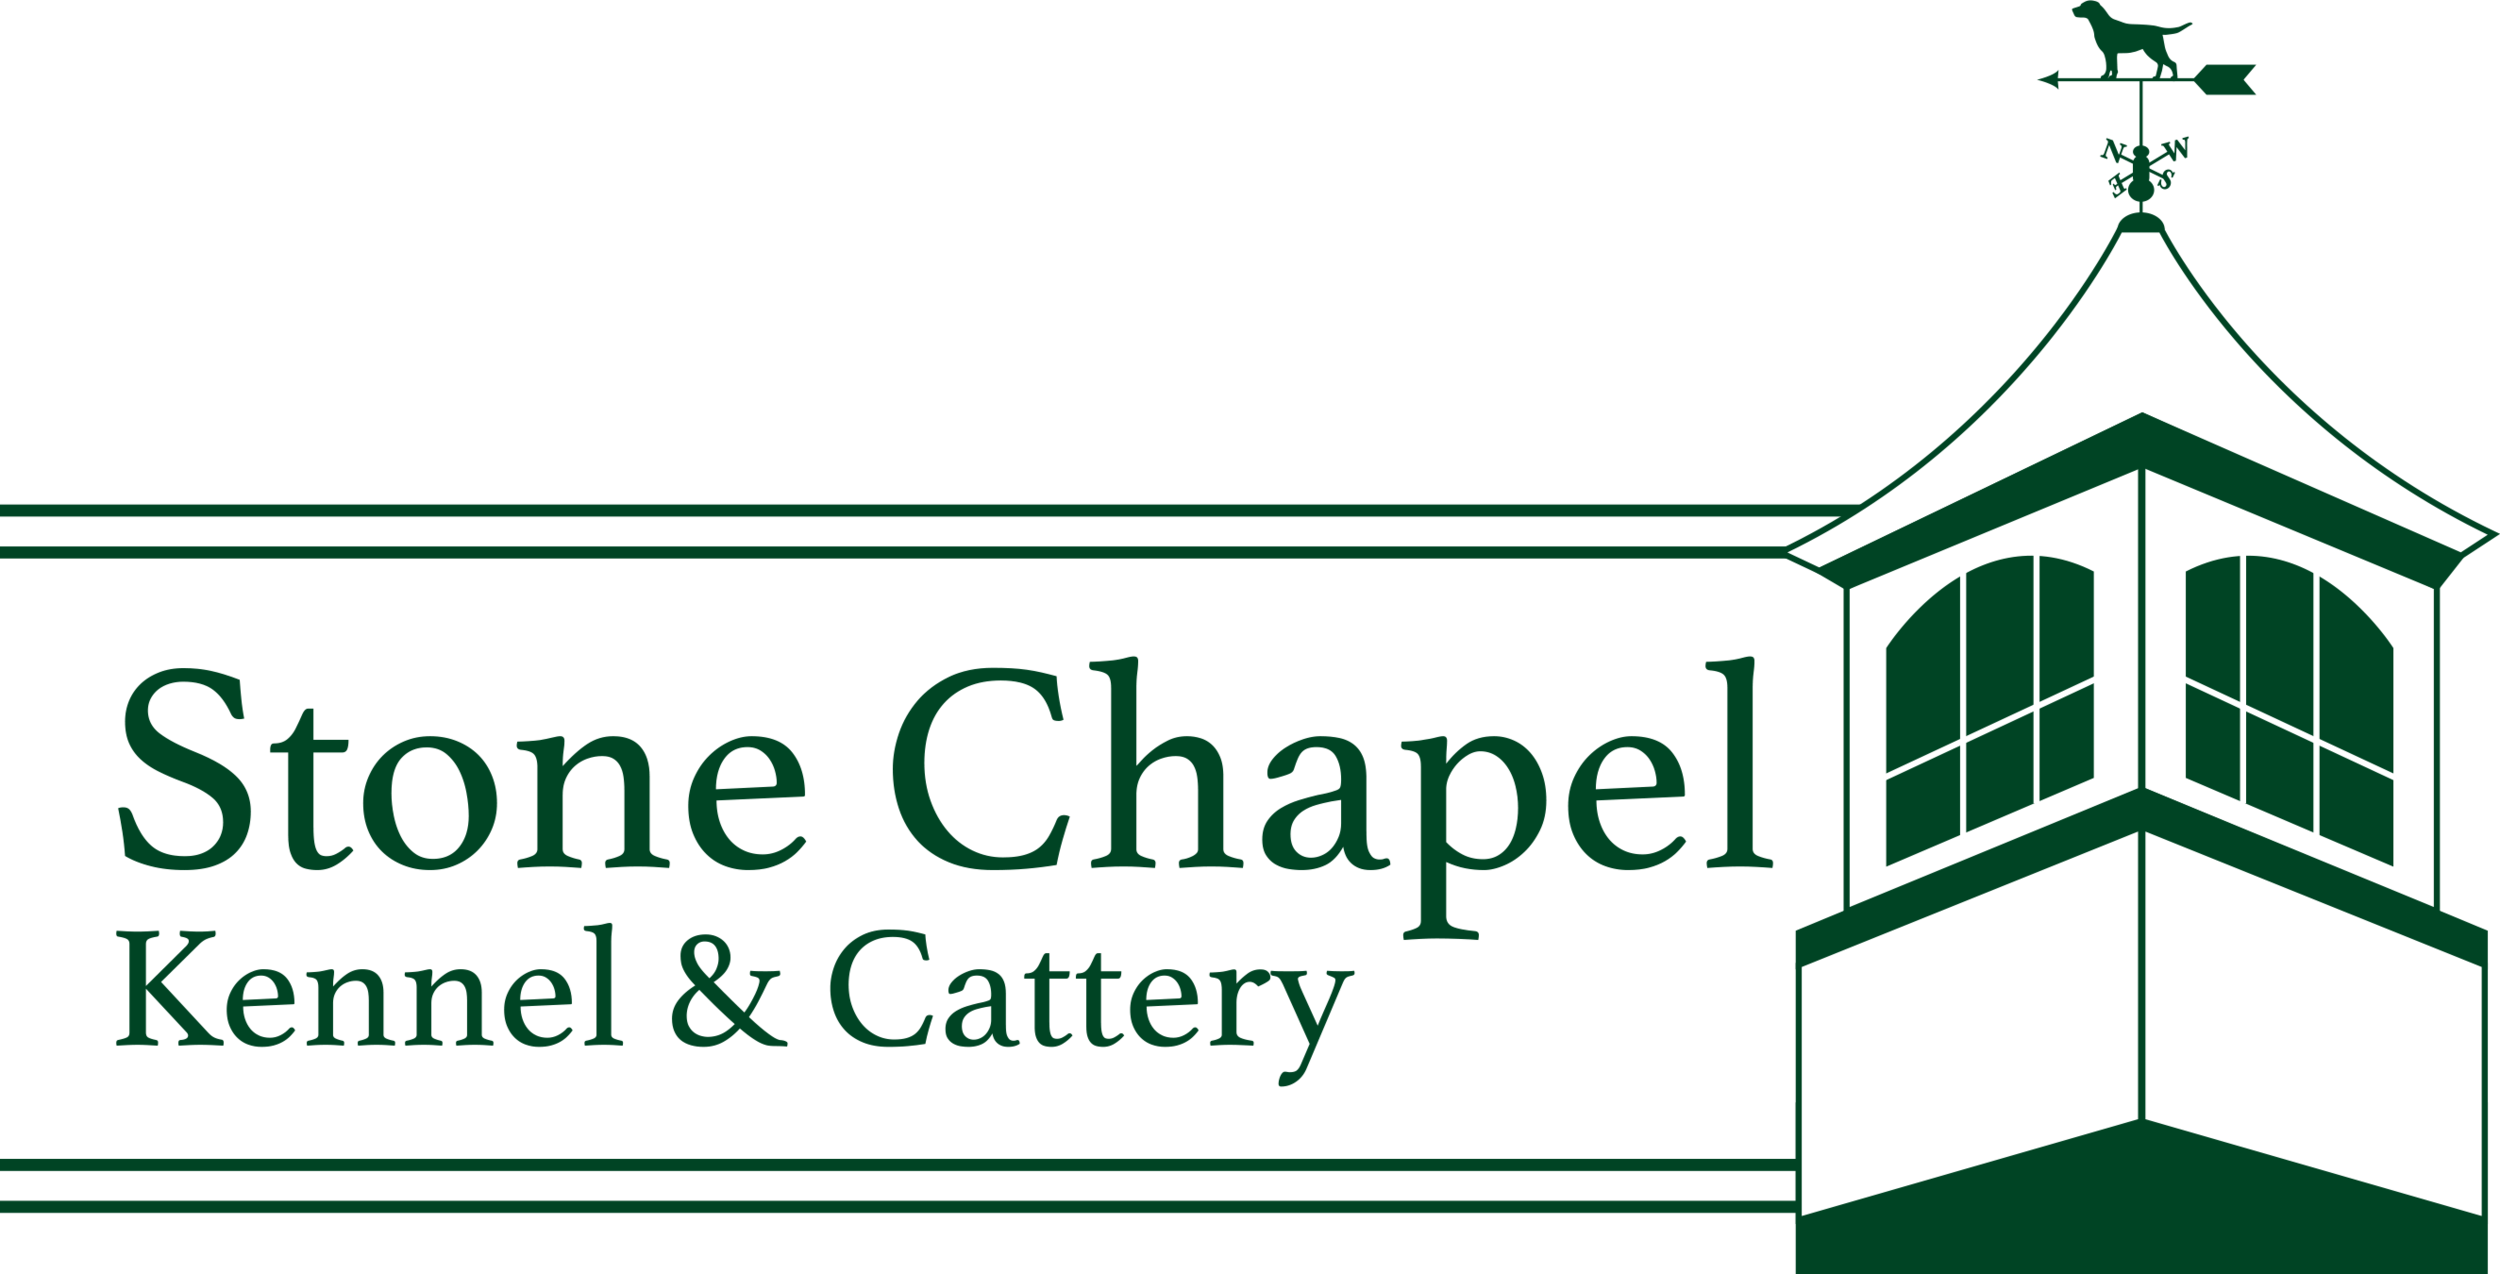 StoneChapel_LogoFinal.png